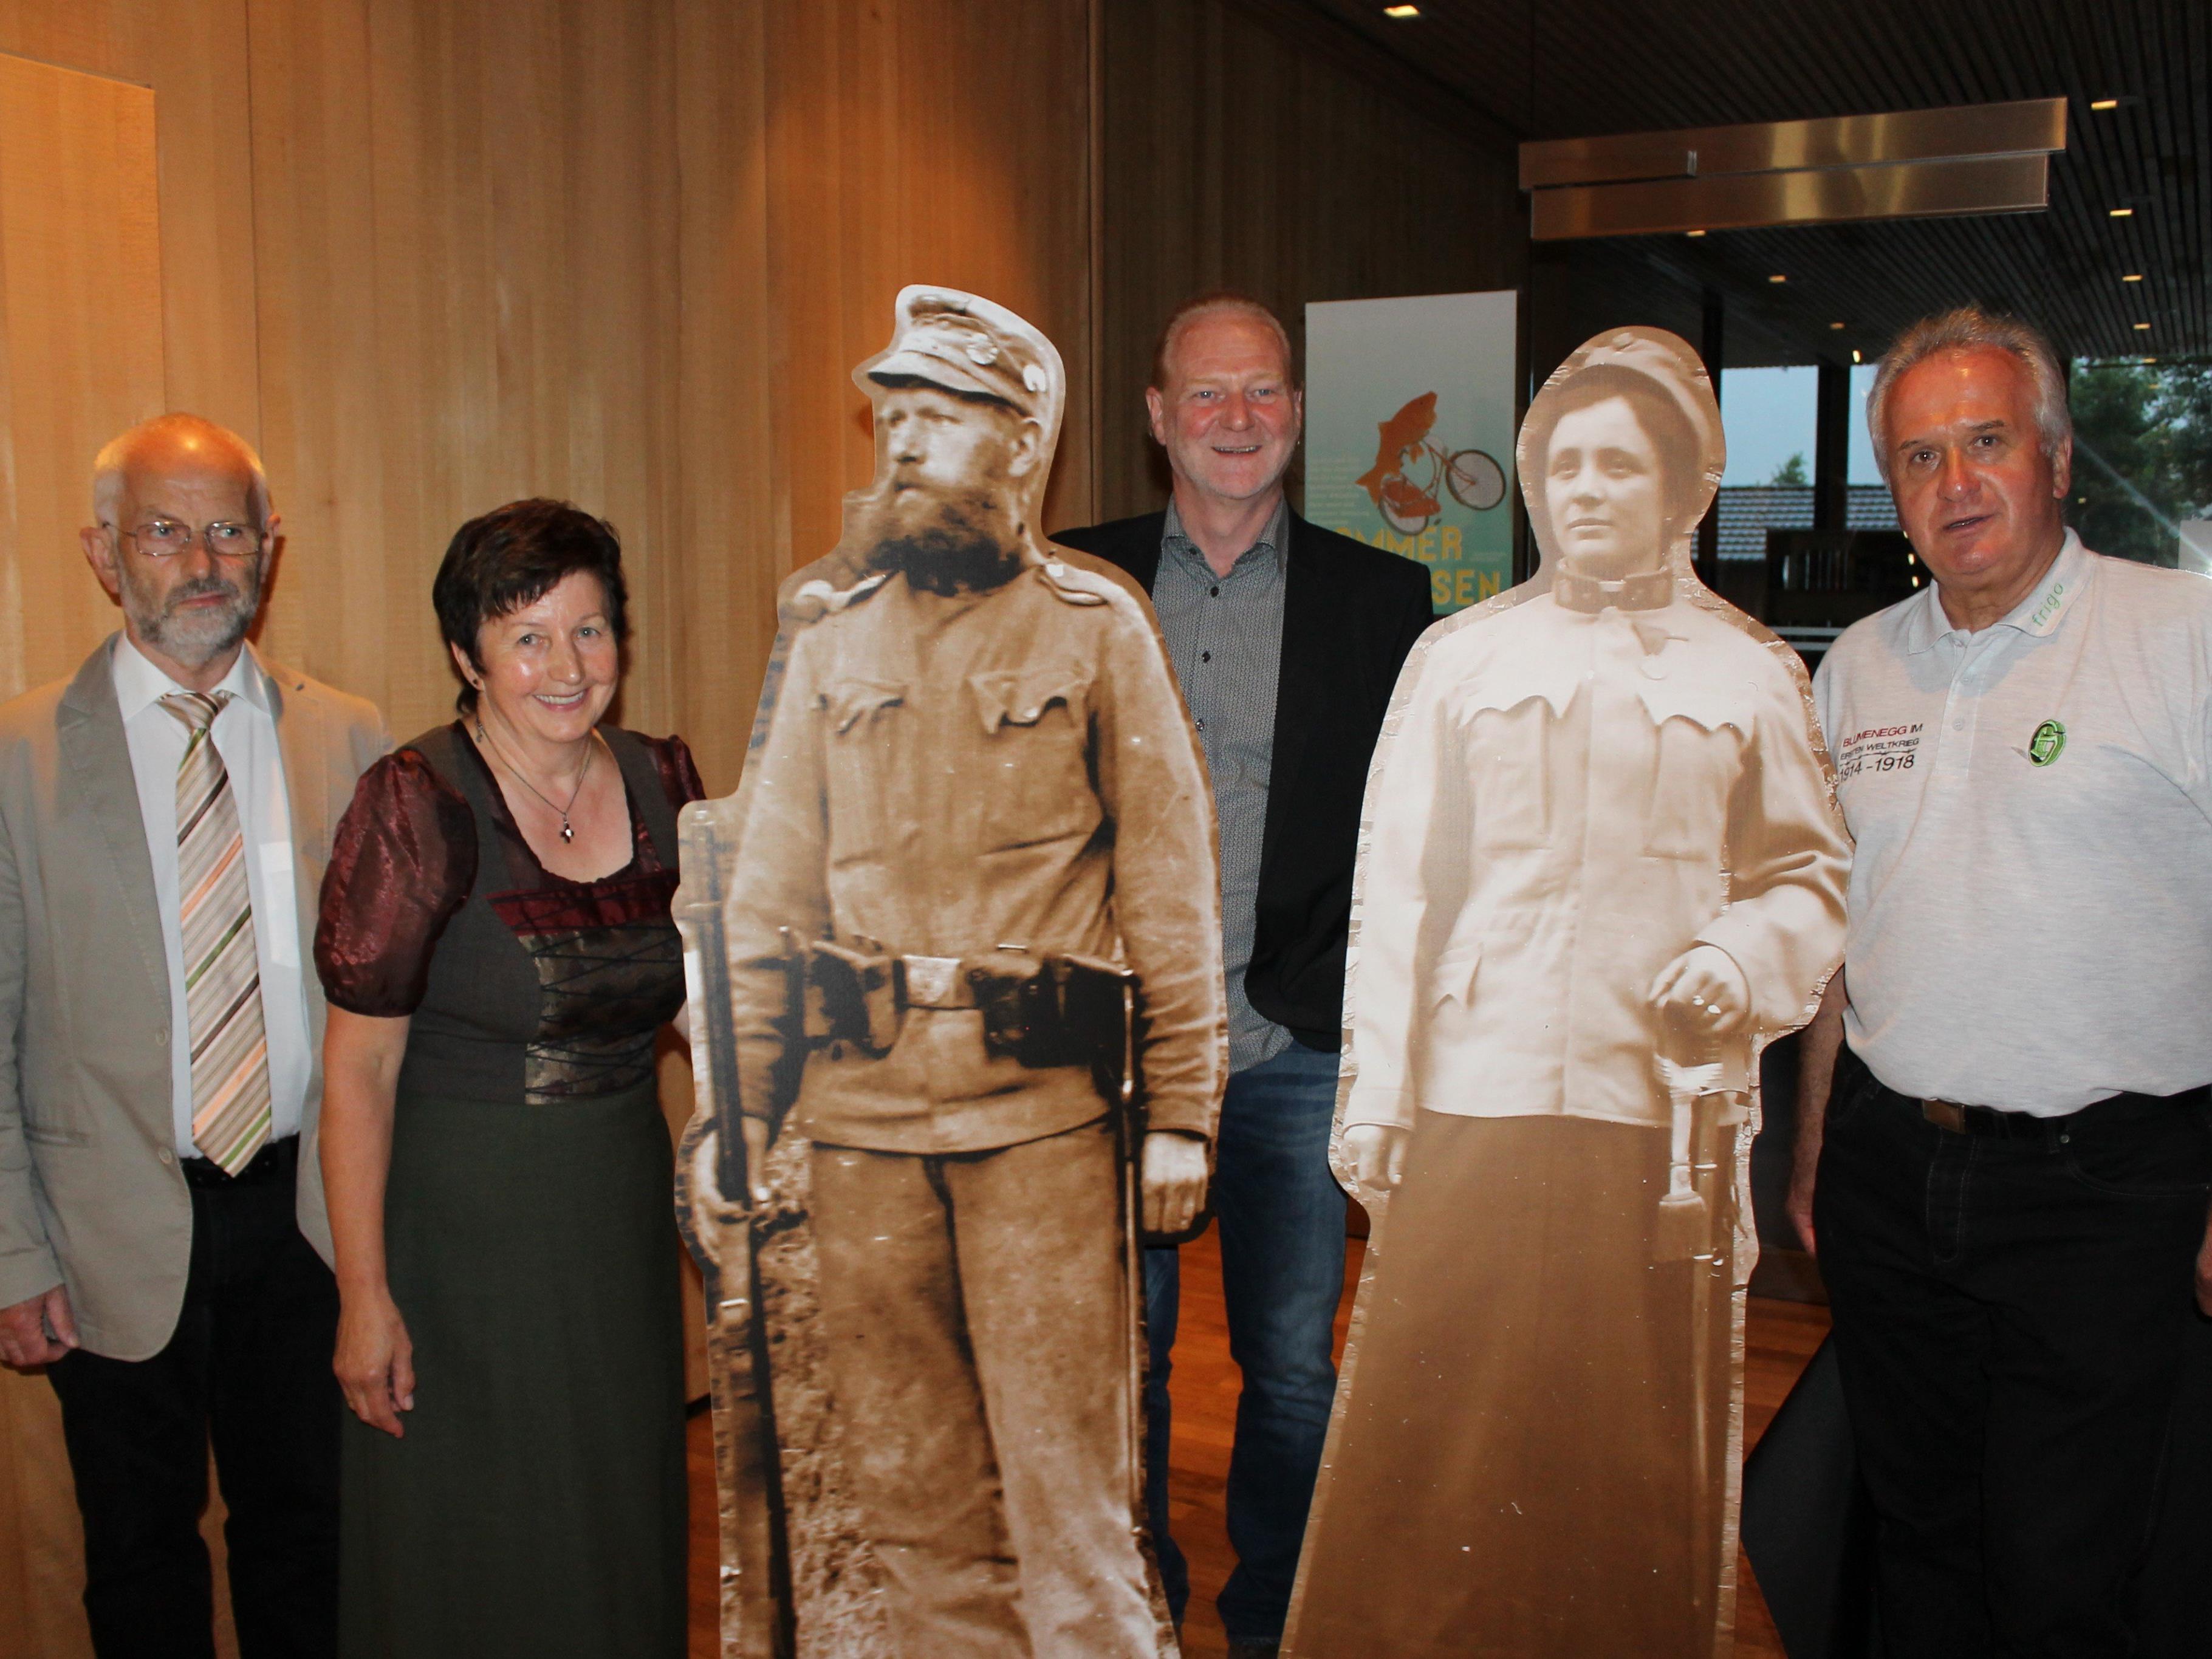 v.li.Wilfried Ammann, Marianne Pfefferkorn, Johannes Wucher und Manfred Sutter